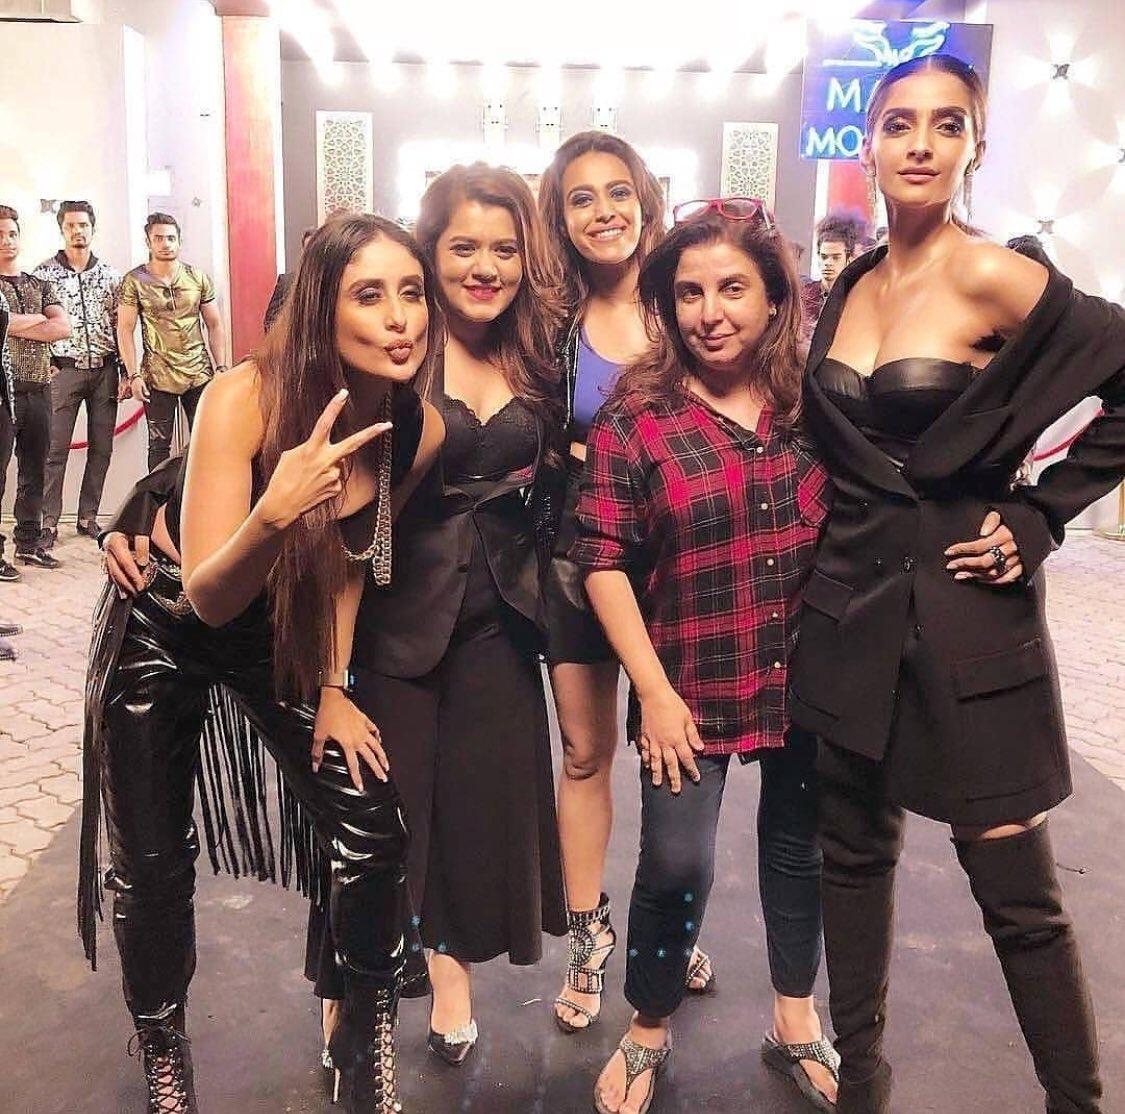 Tareefan From Veere Di Wedding Badshah Qaran: Veere Di Wedding Turns Up Heat With Choreographed Song